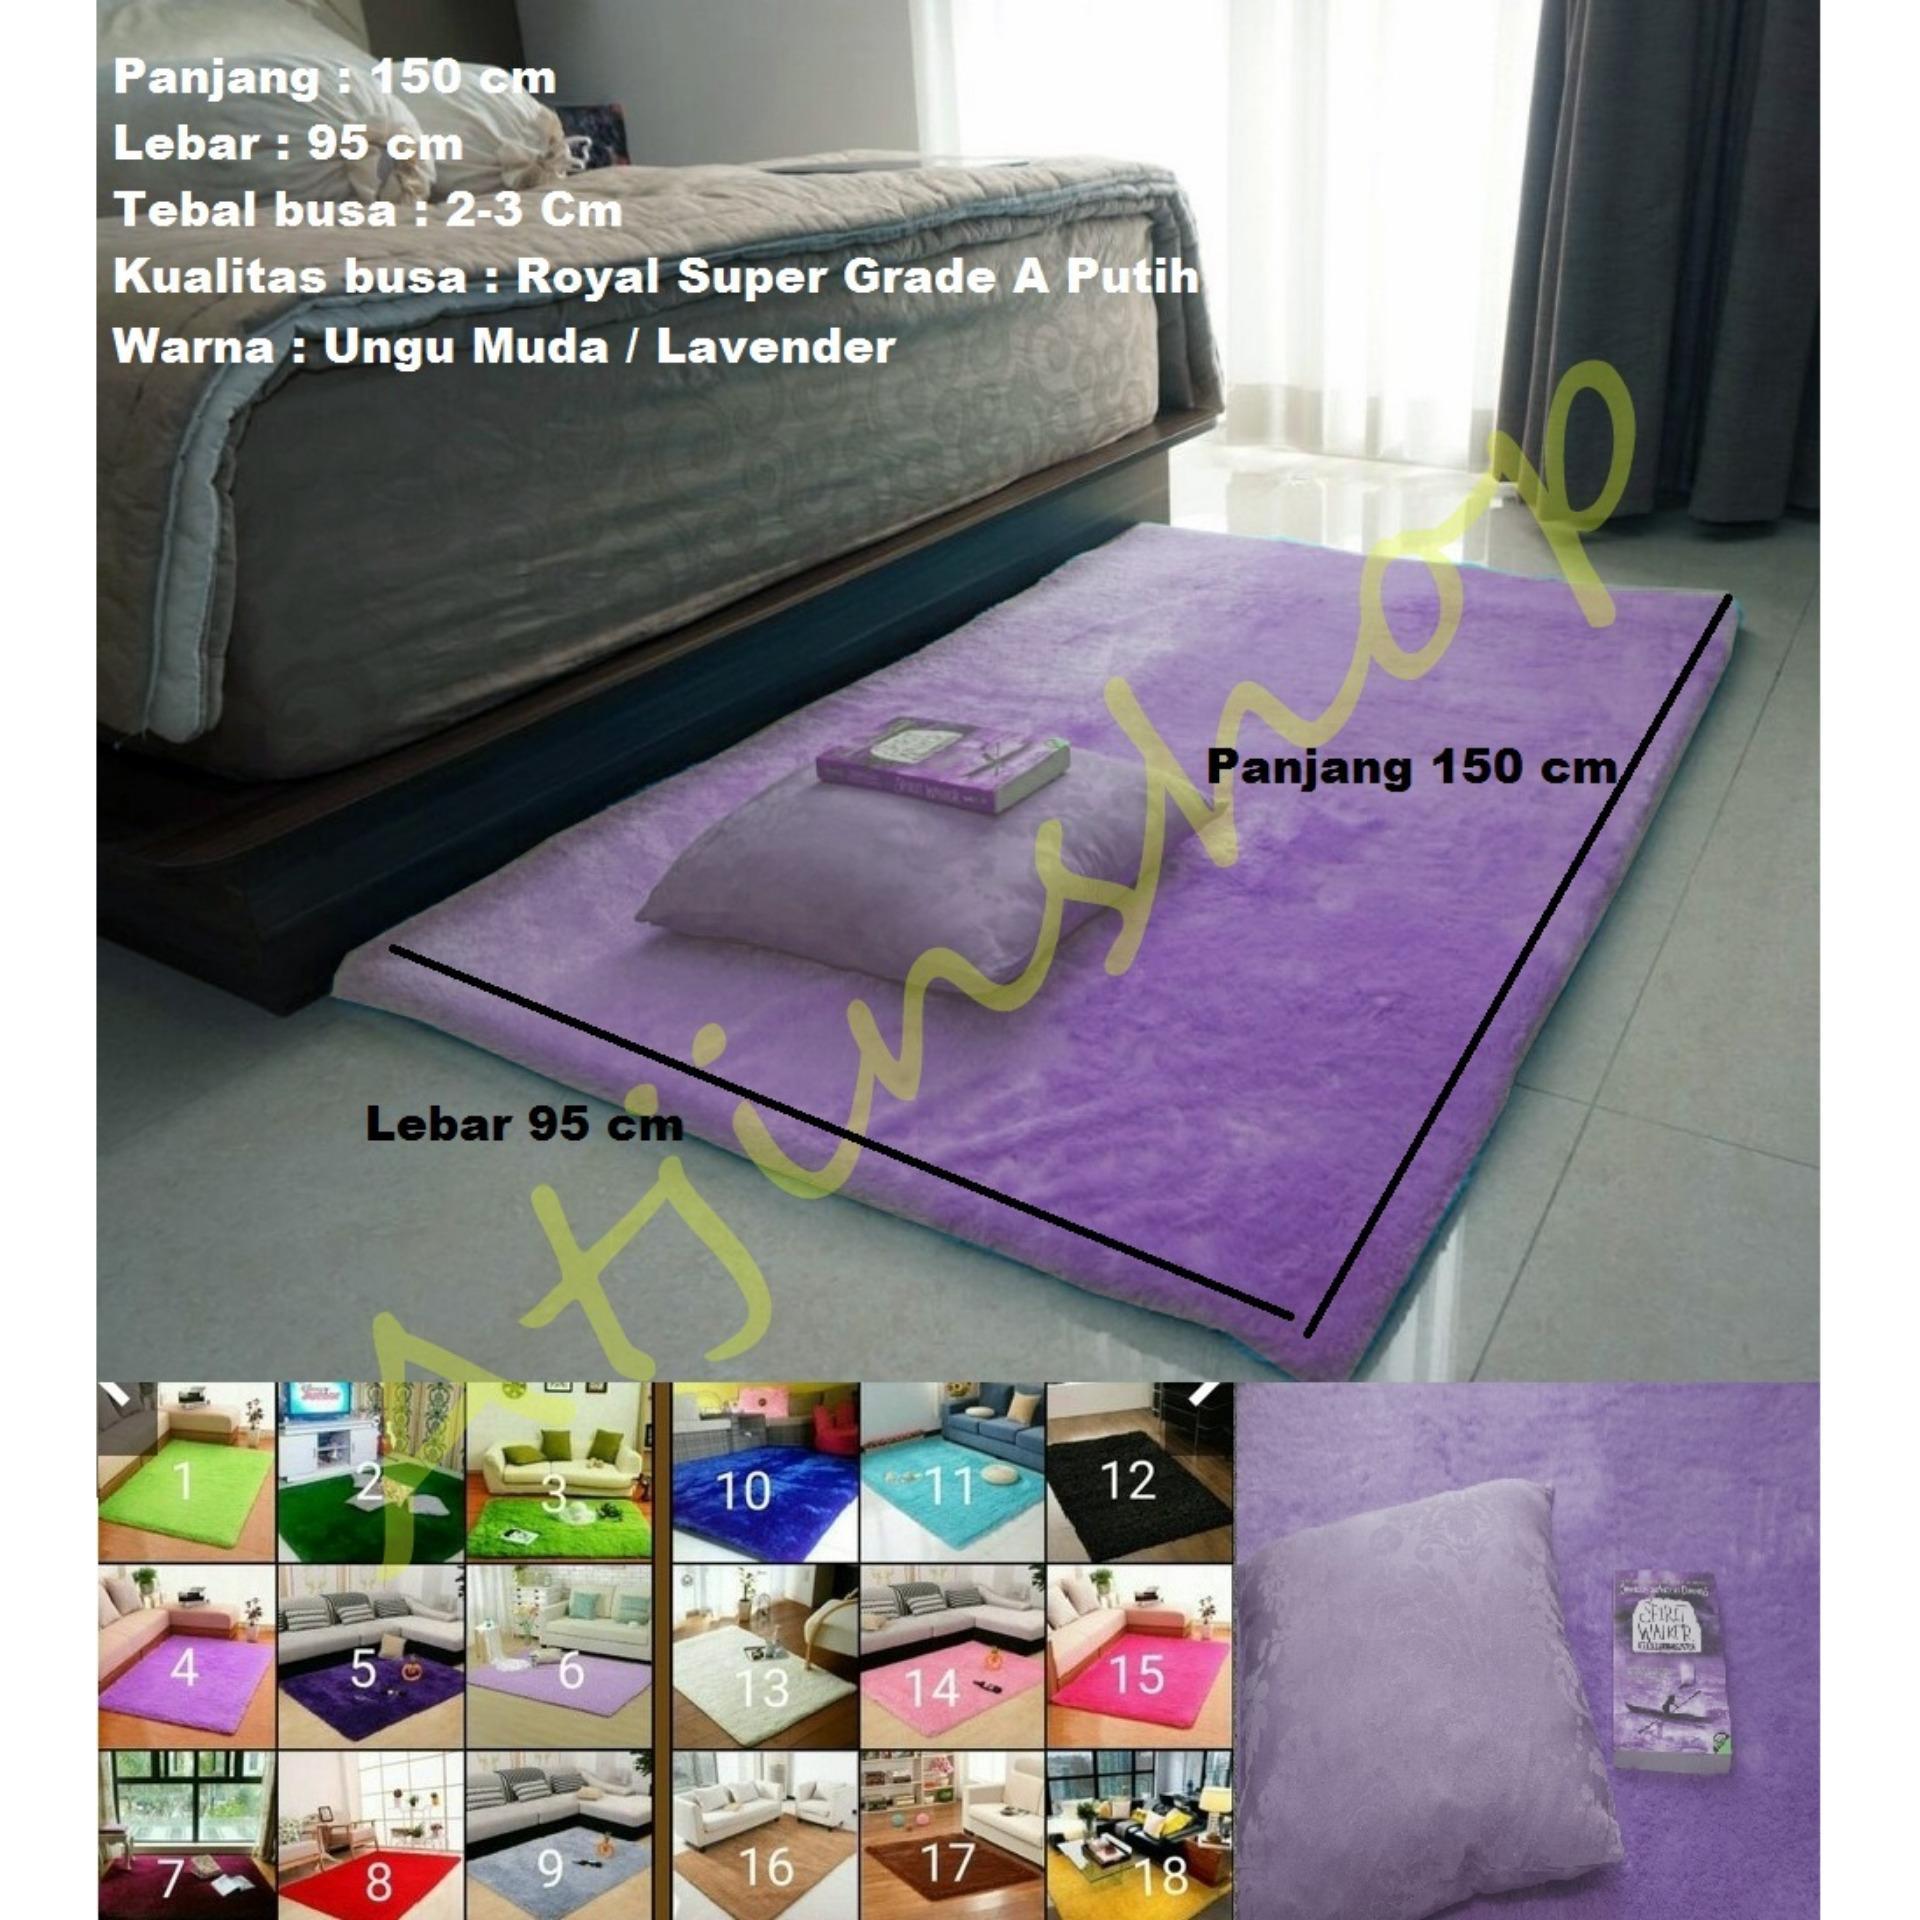 TjinCollection-Karpet Bulu Rasfur Busa Polos Berkualitas 150x100Cm [Ready 16 Warna]